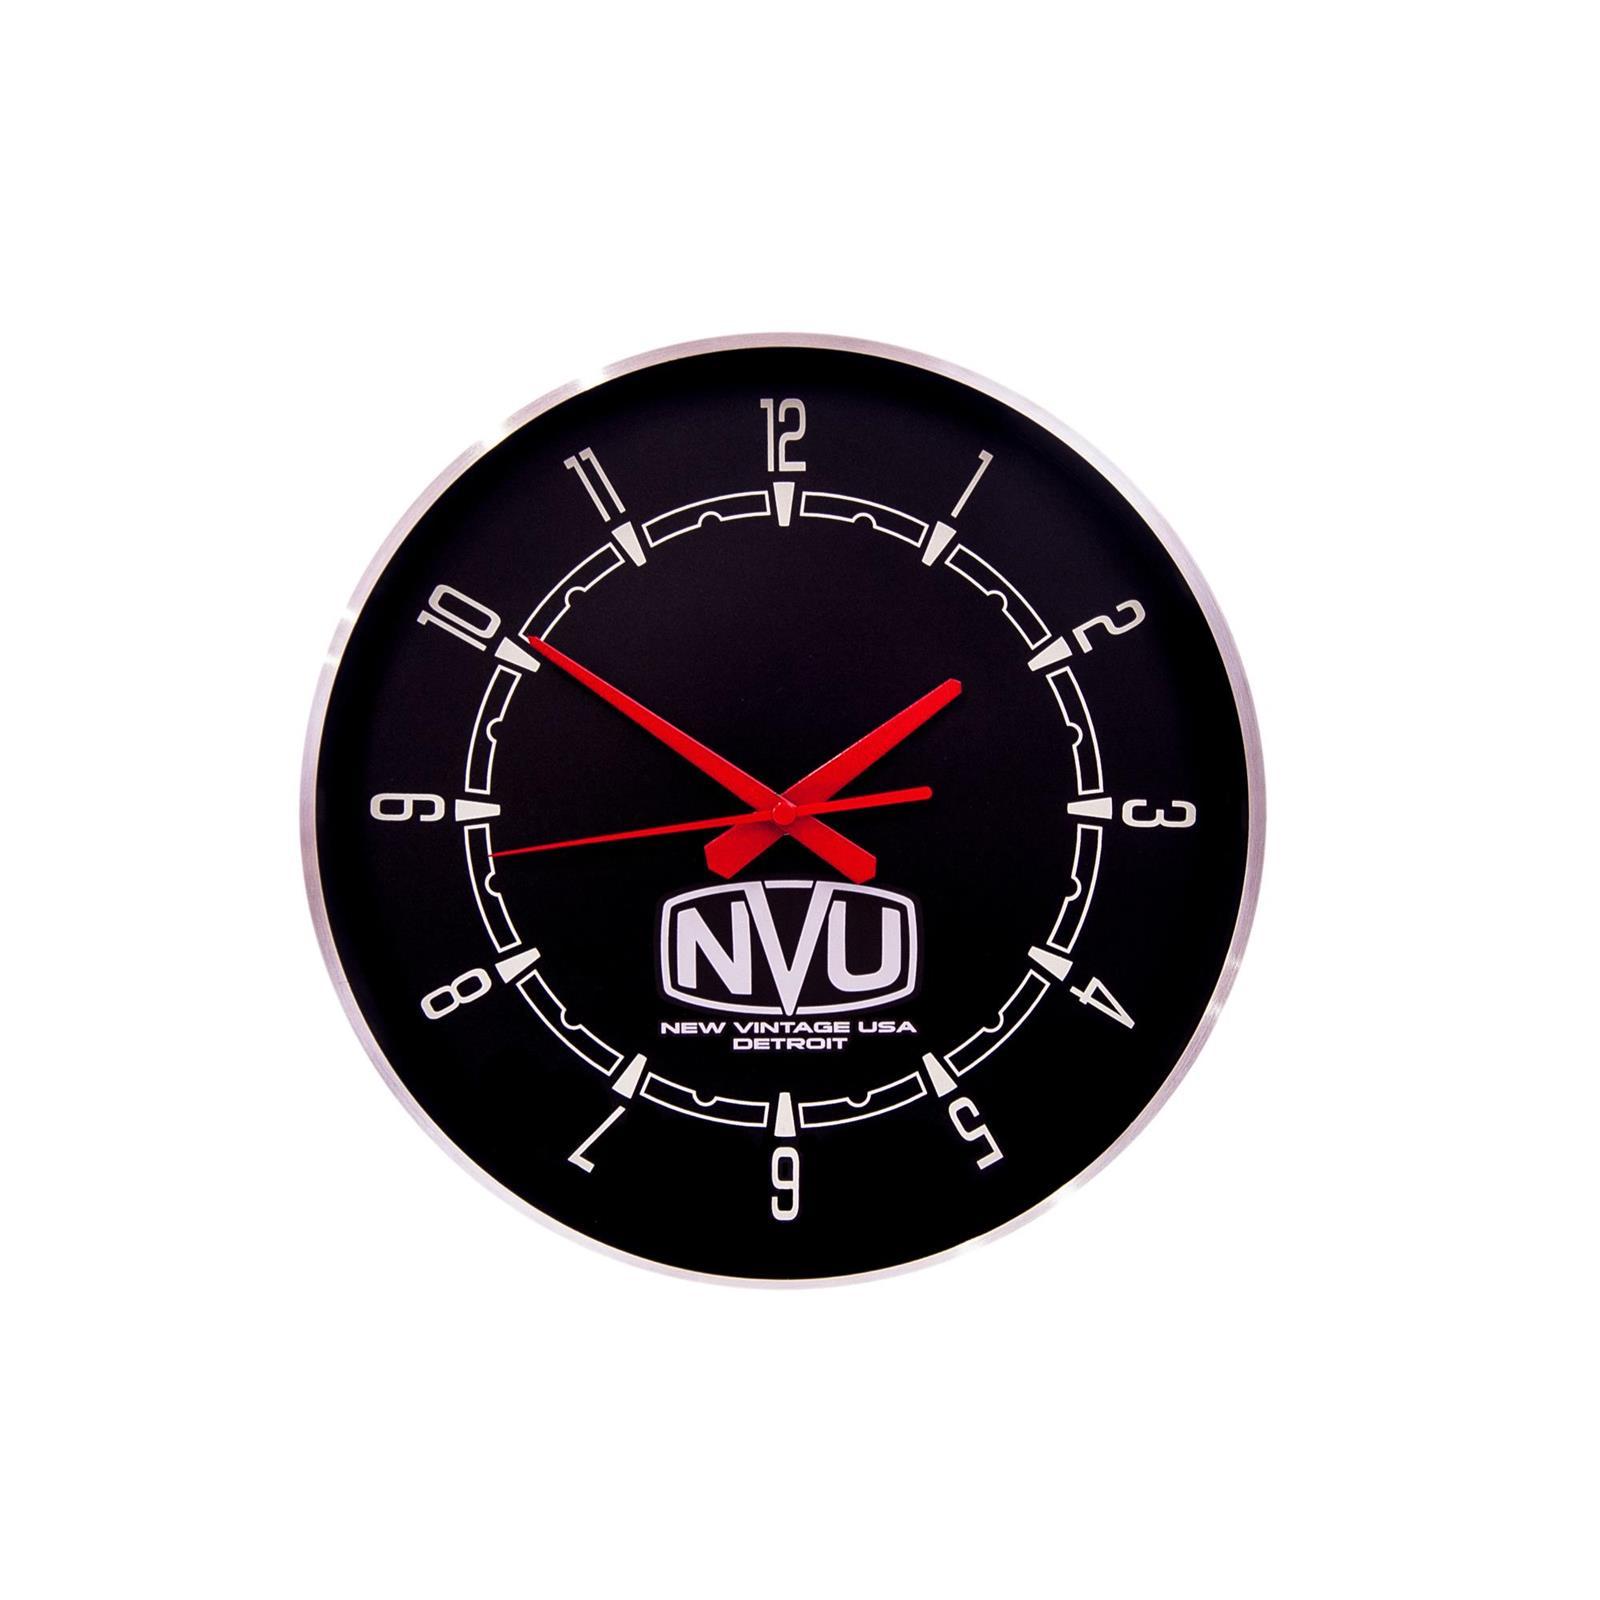 New Vintage Usa 37192 01 New Vintage Wall Clock Black